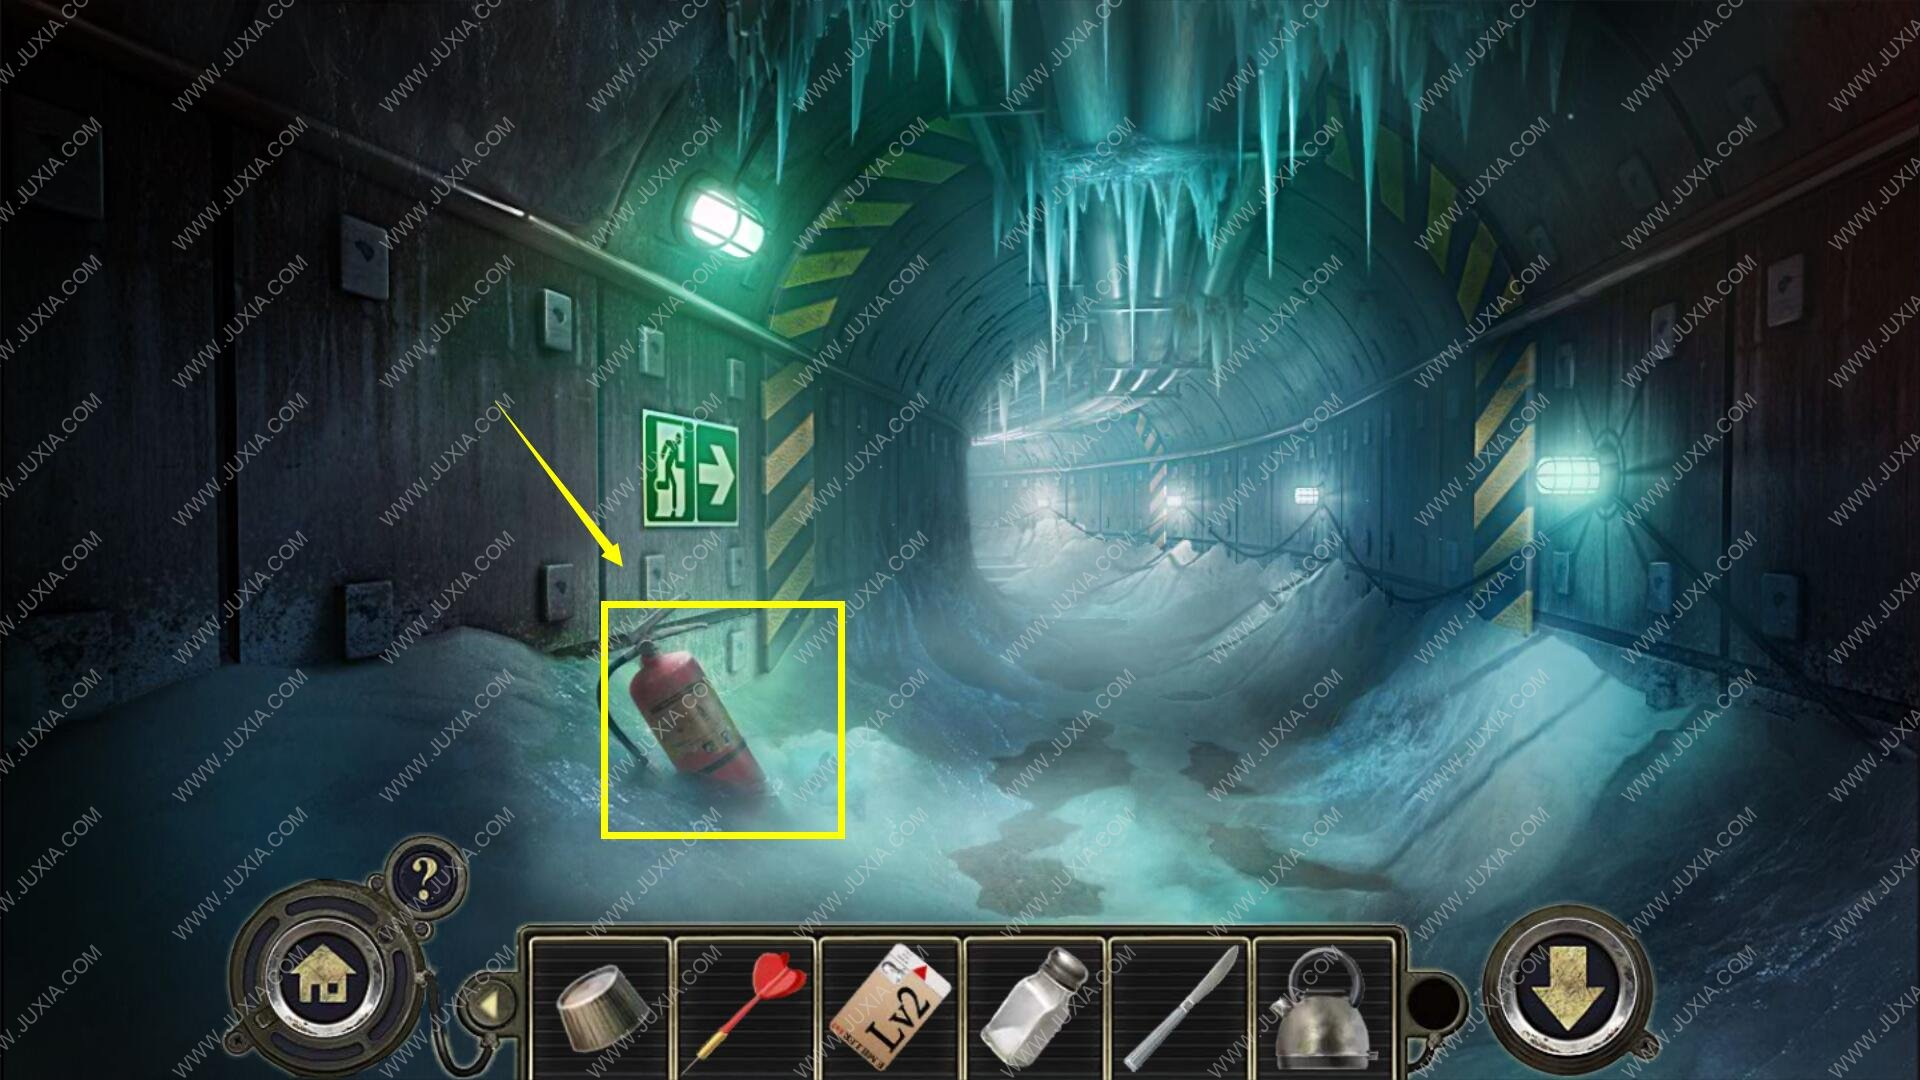 Facility47攻略第一关图文 47号房间攻略第1关钥匙在哪里